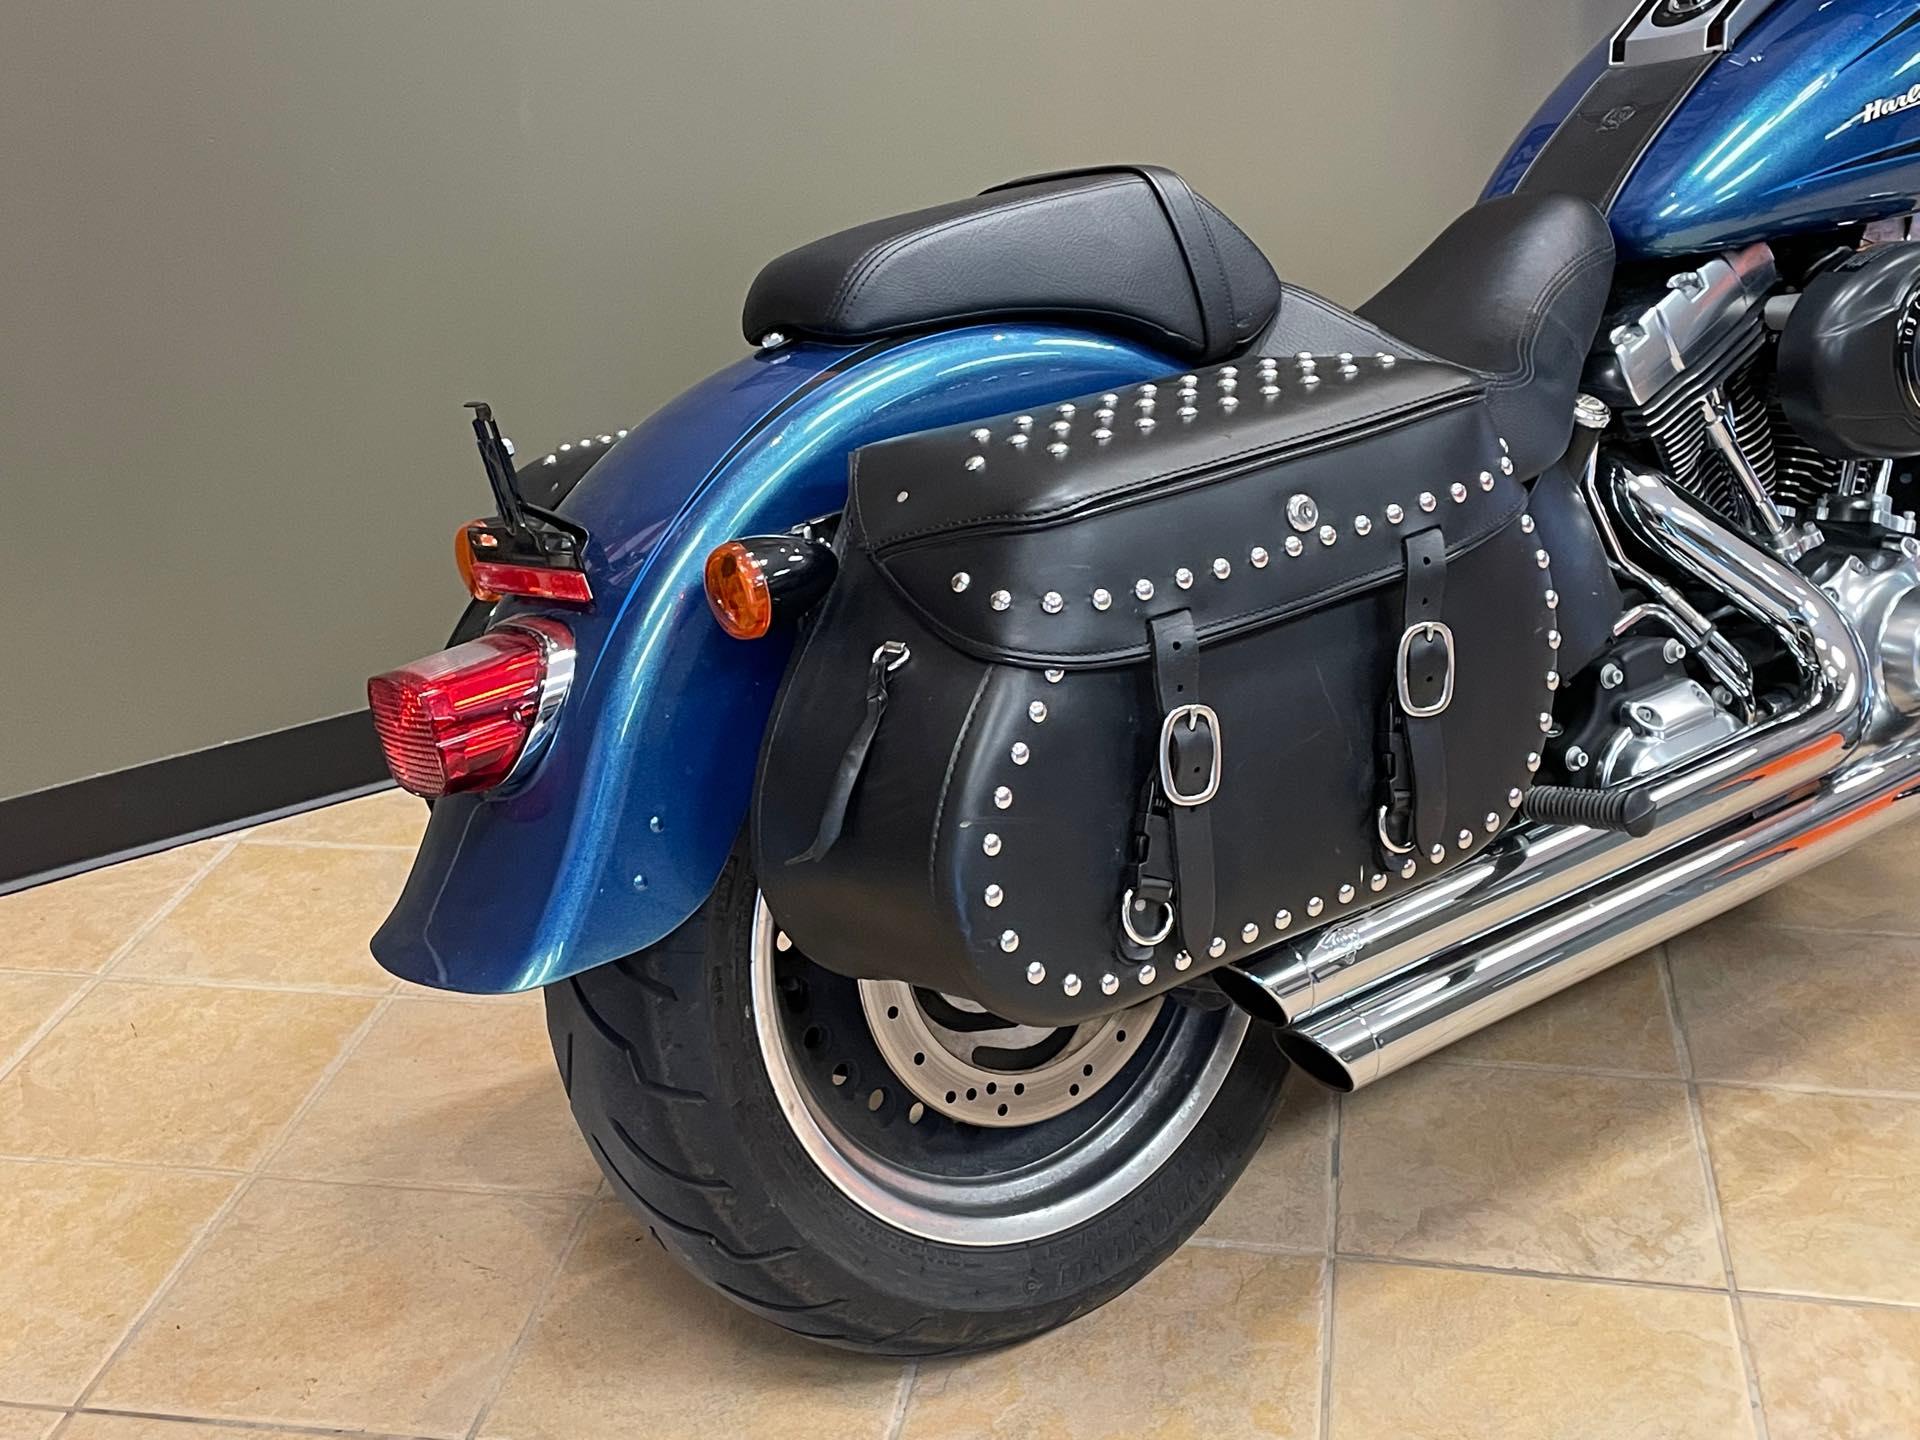 2014 Harley-Davidson Softail Fat Boy Lo at Loess Hills Harley-Davidson